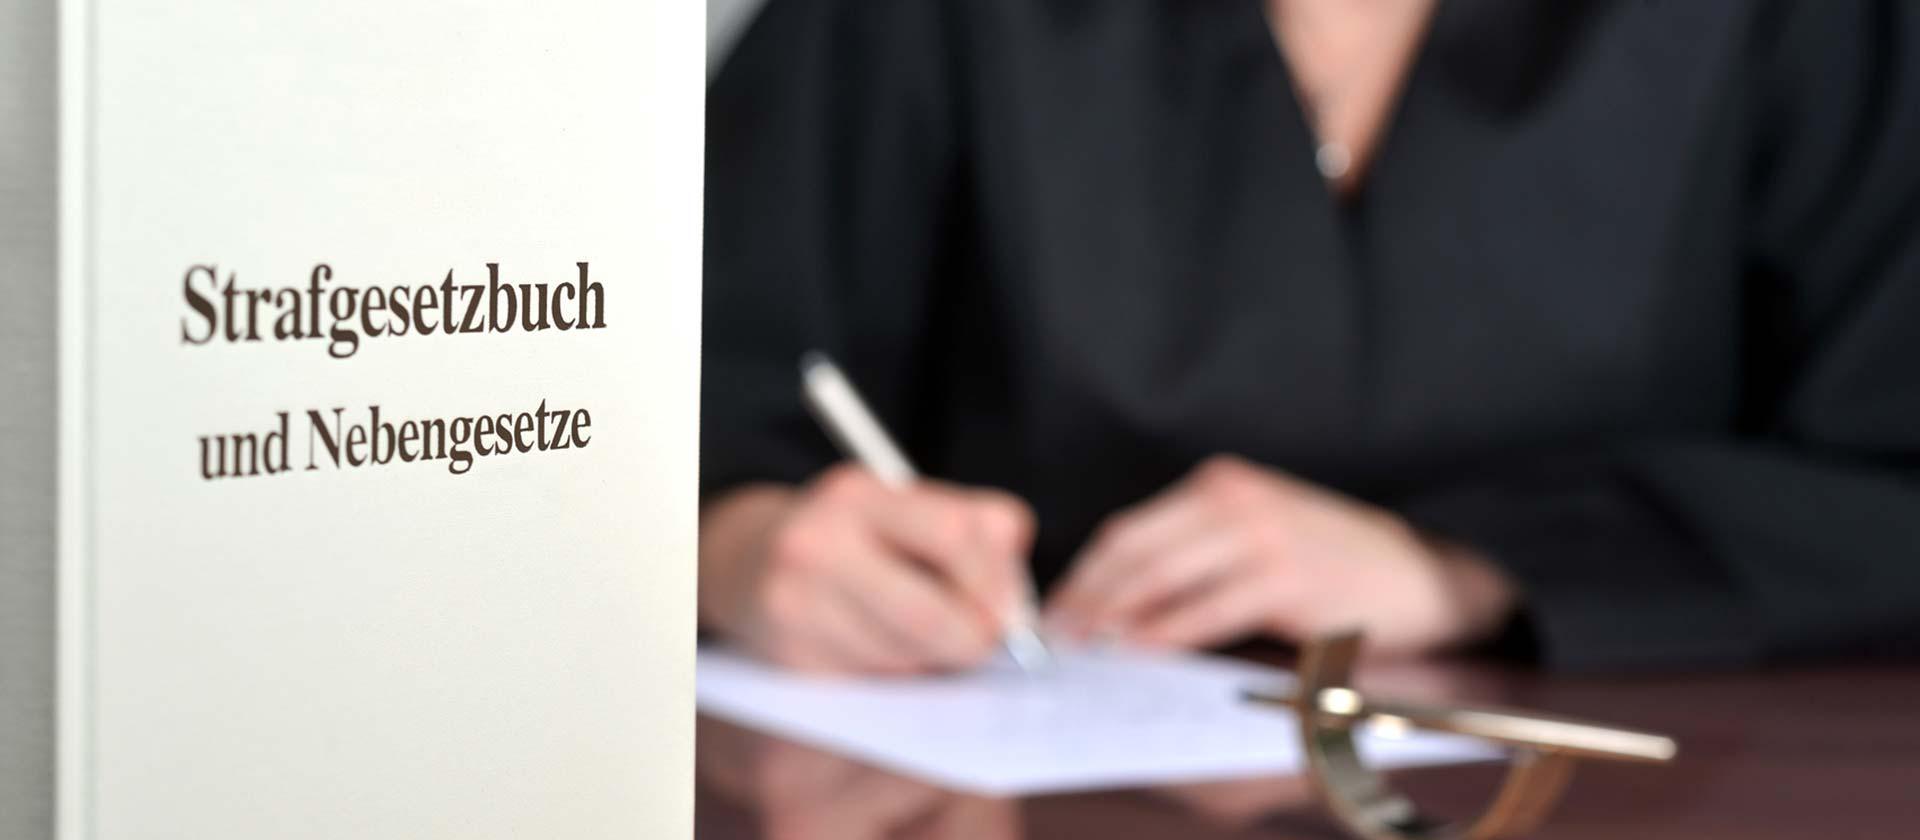 Rechtsanwalt Schöllhorn-Gaar in Landshut